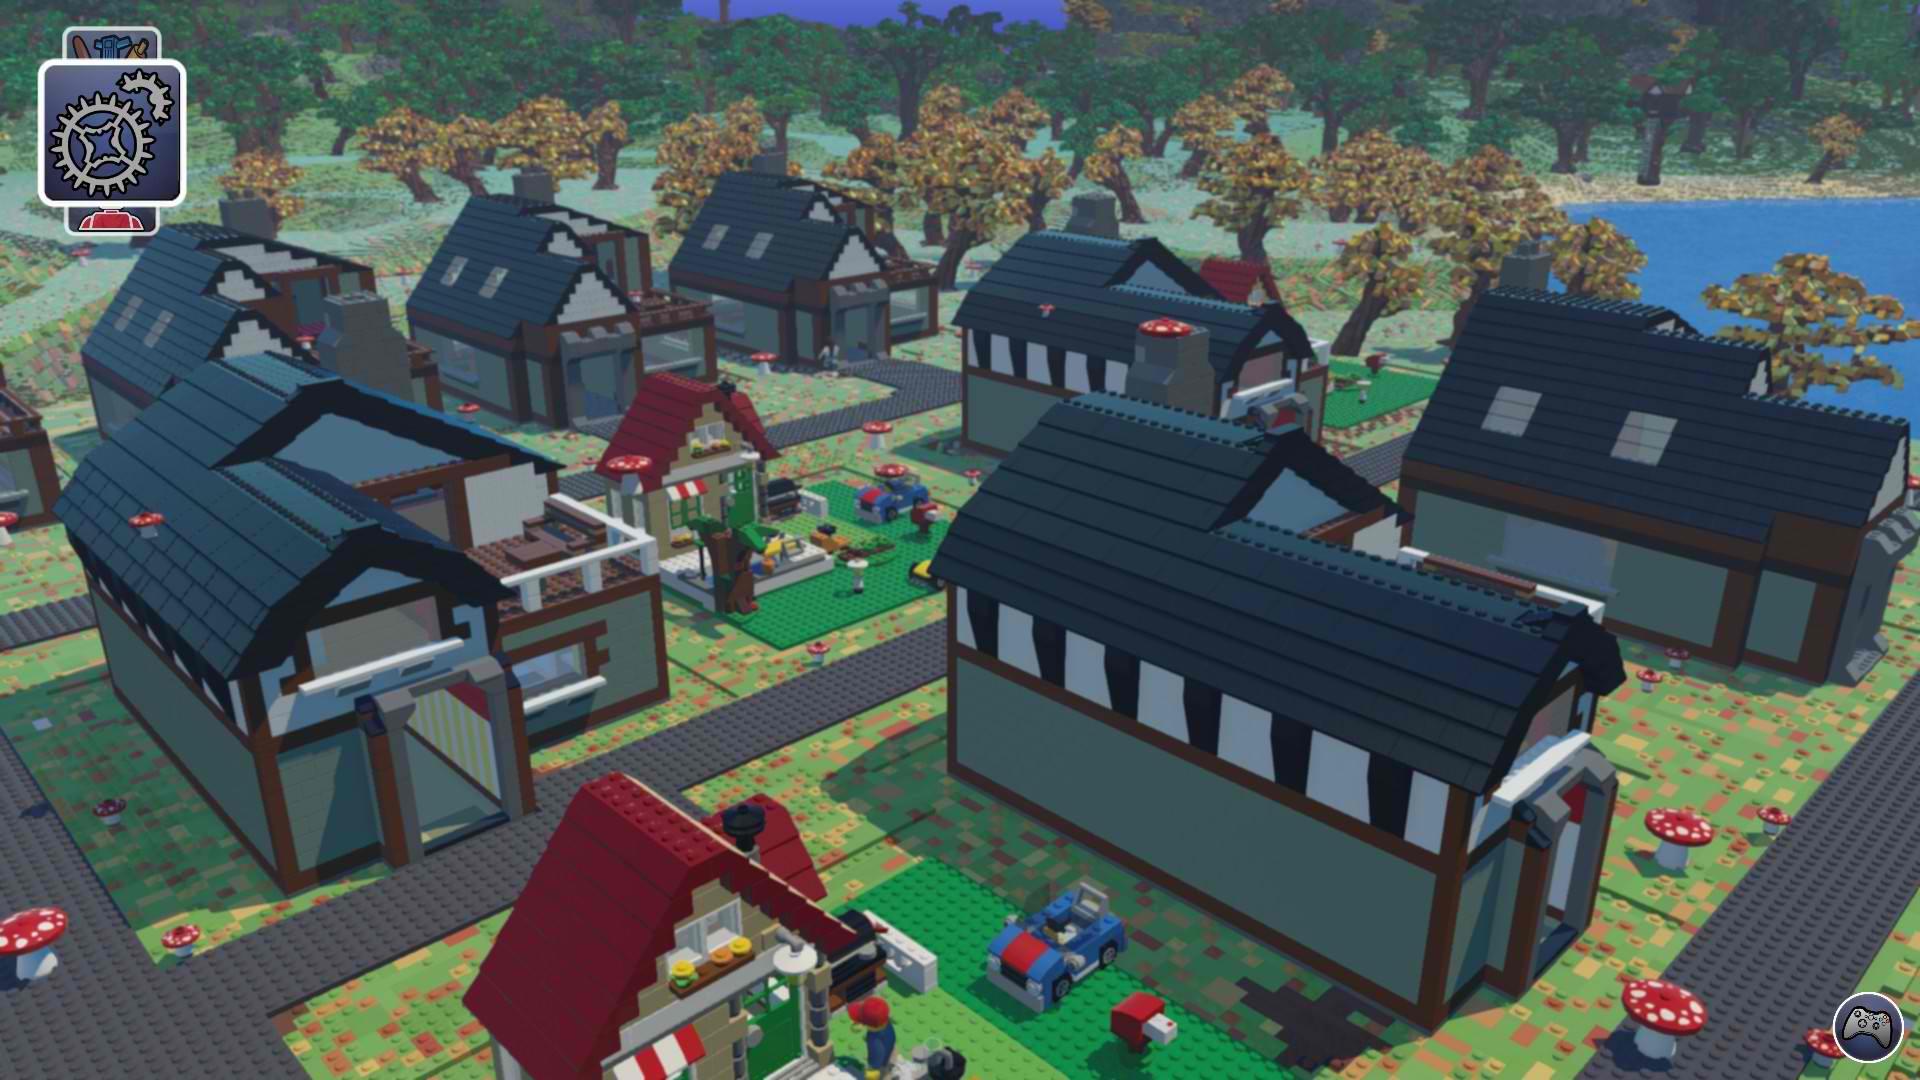 Lego lanseaza un joc rival pentru Minecraft denumit Lego Worlds